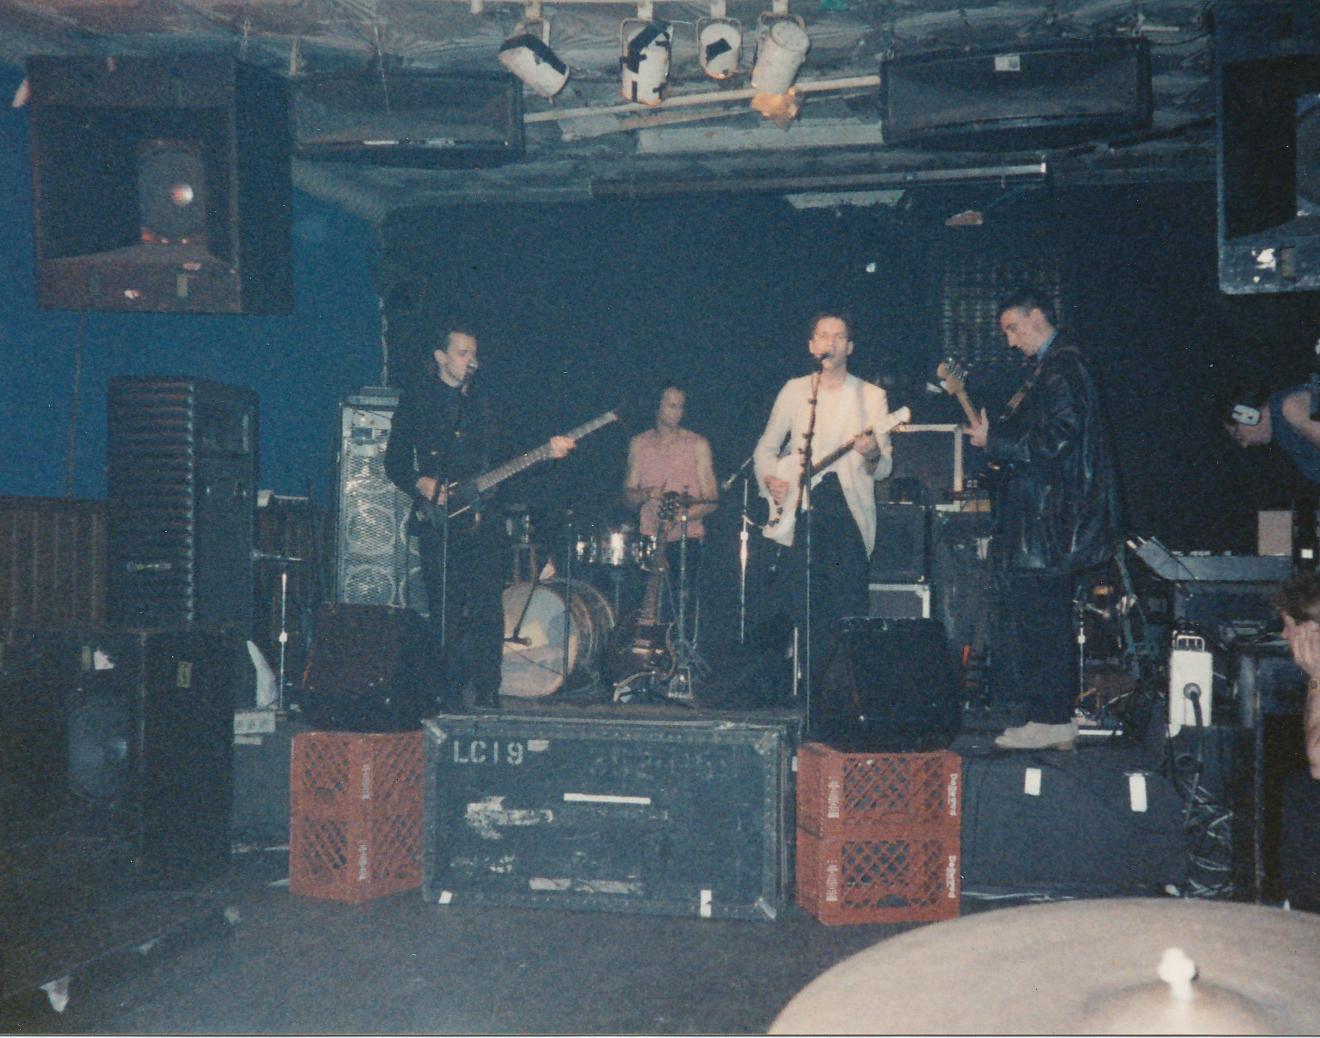 Wire soundcheck at Maxwell's, 1987 (Jim DeRogatis).